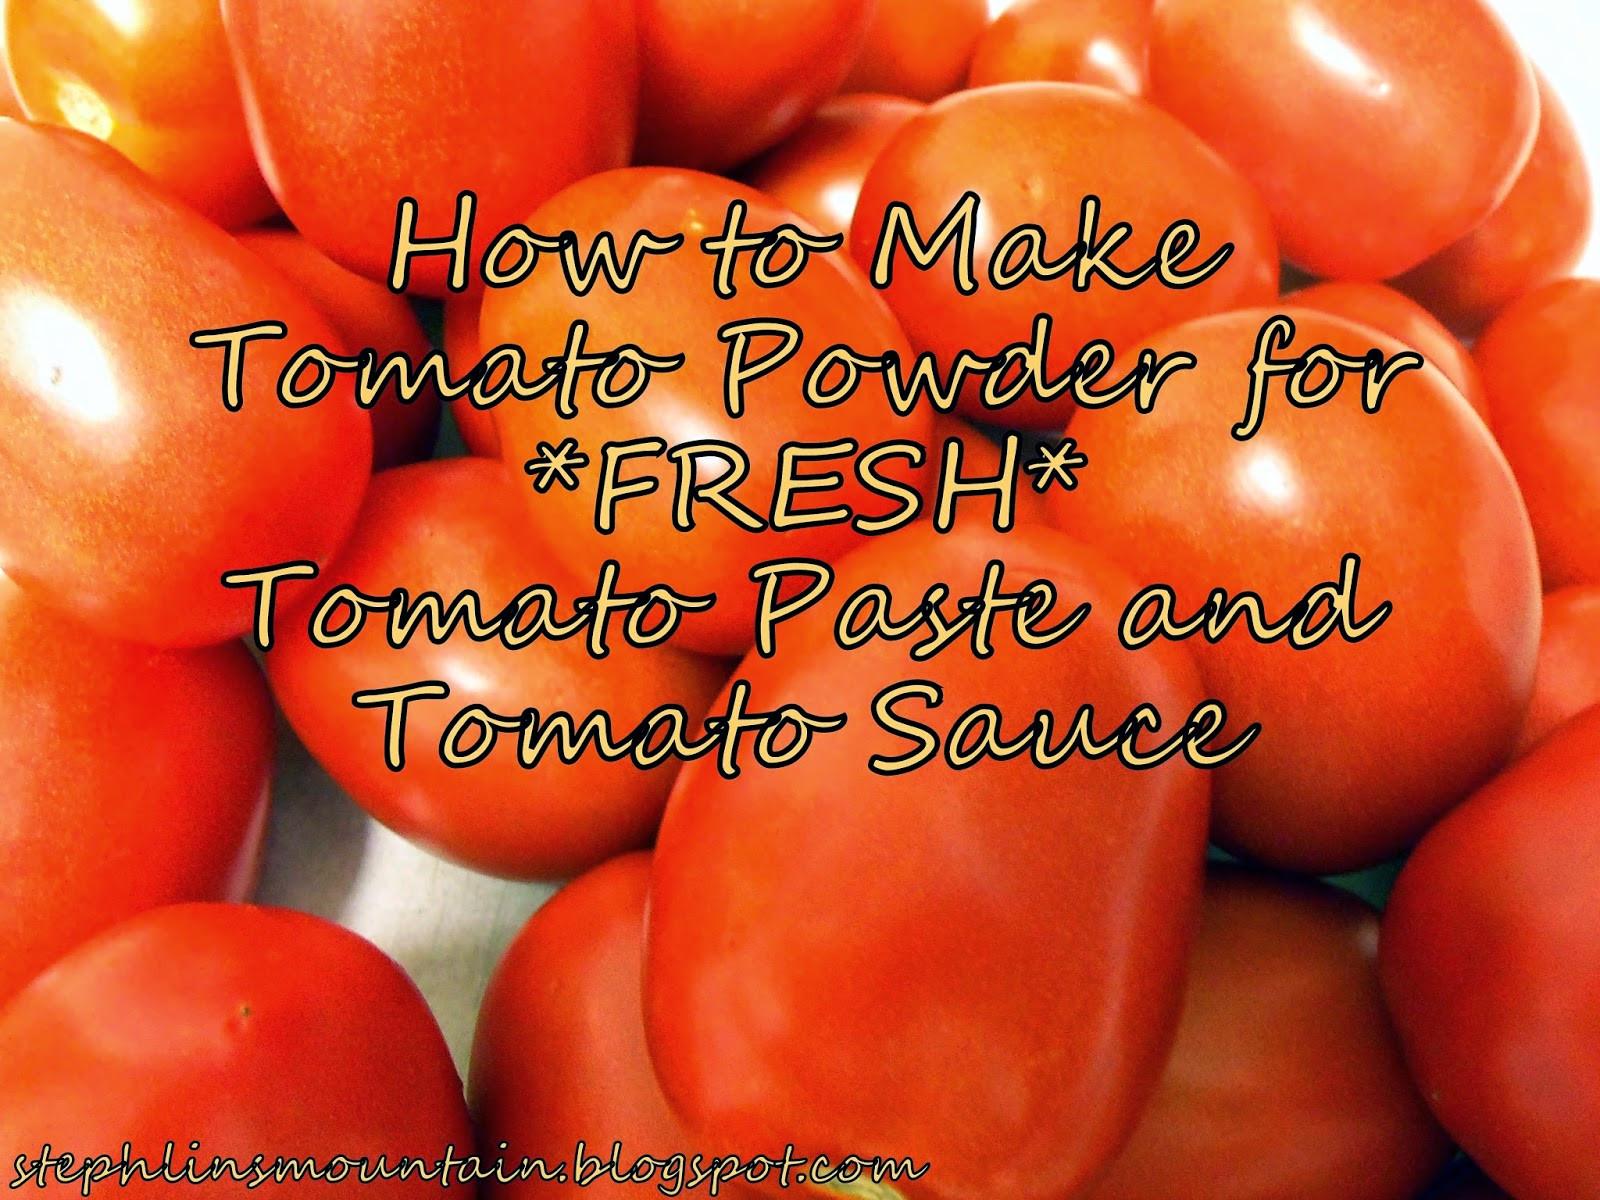 How To Make Tomato Sauce Out Of Tomato Paste  Stephlin s Mountain How to Make Tomato Powder for Fresh